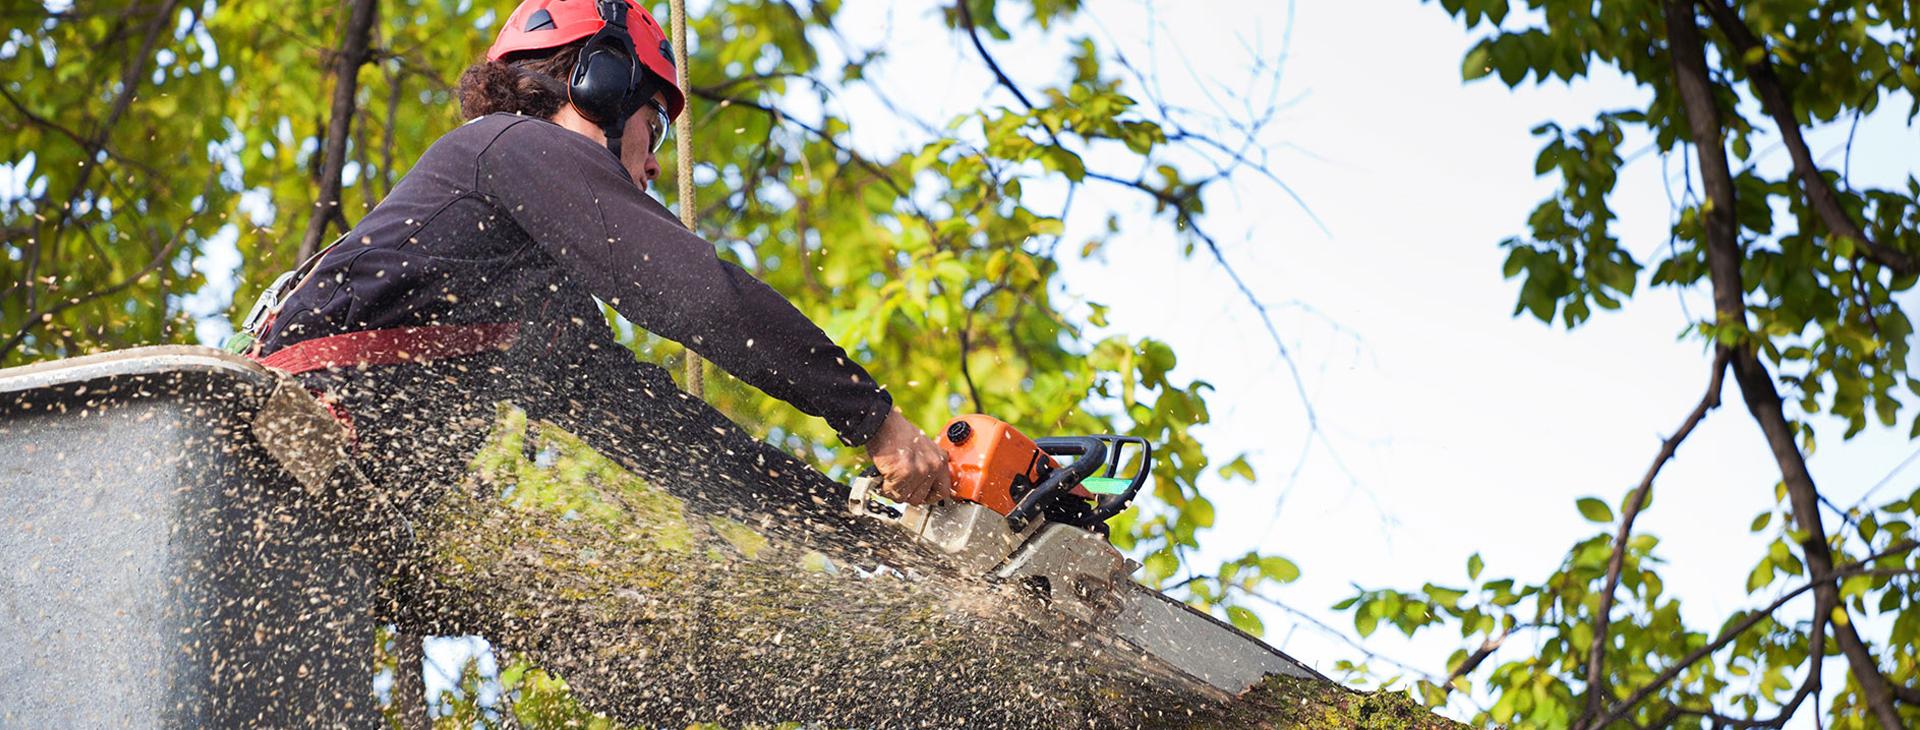 Providing Tree Care Services Since 1986